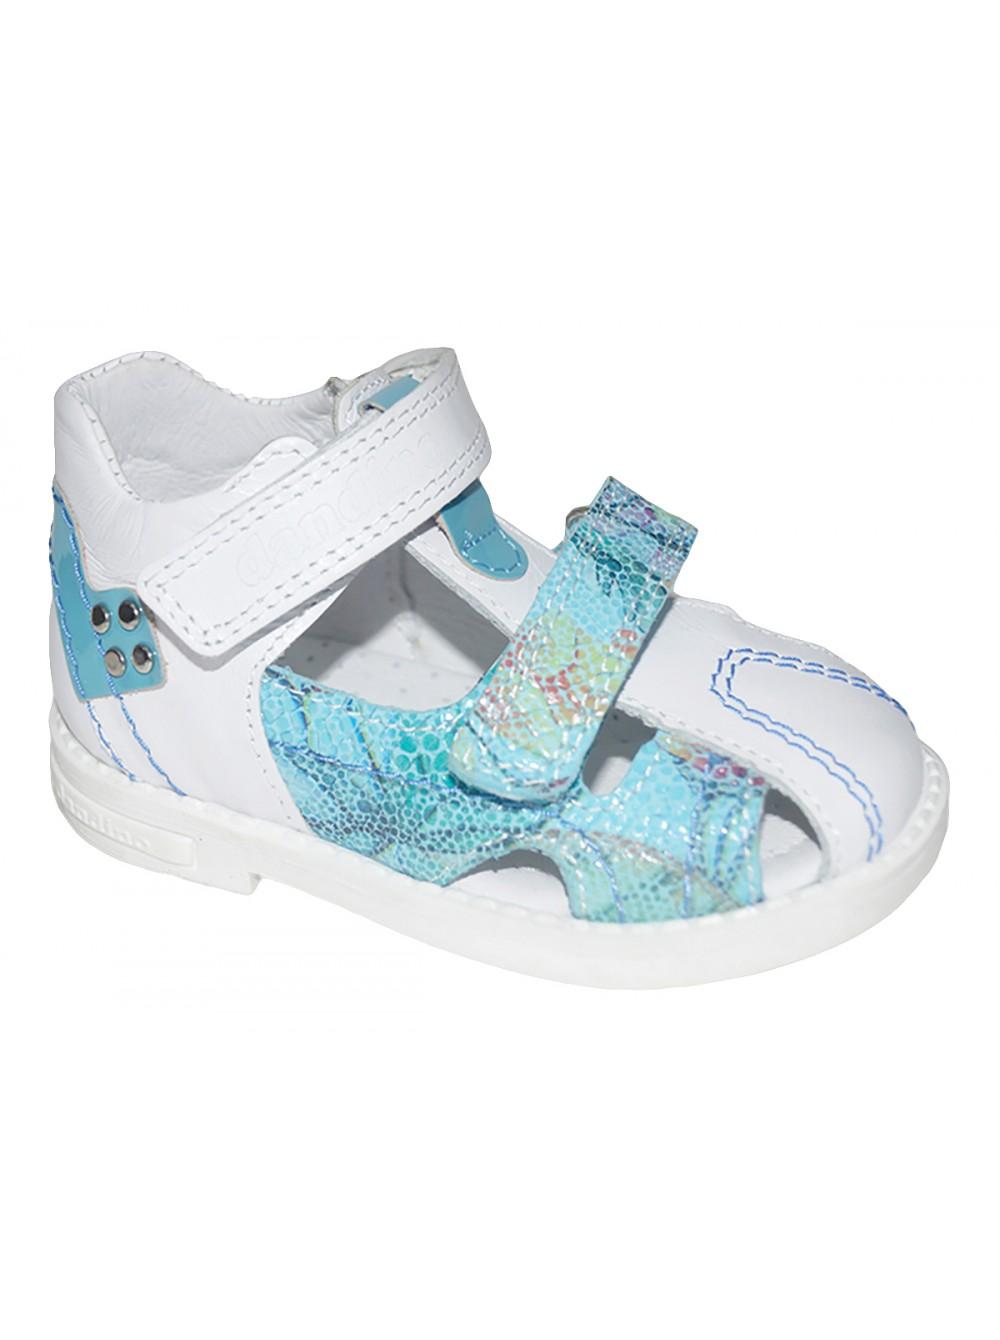 Туфли открытые DANDINO DND2155-23-8A_06 белый/синий (26-30)